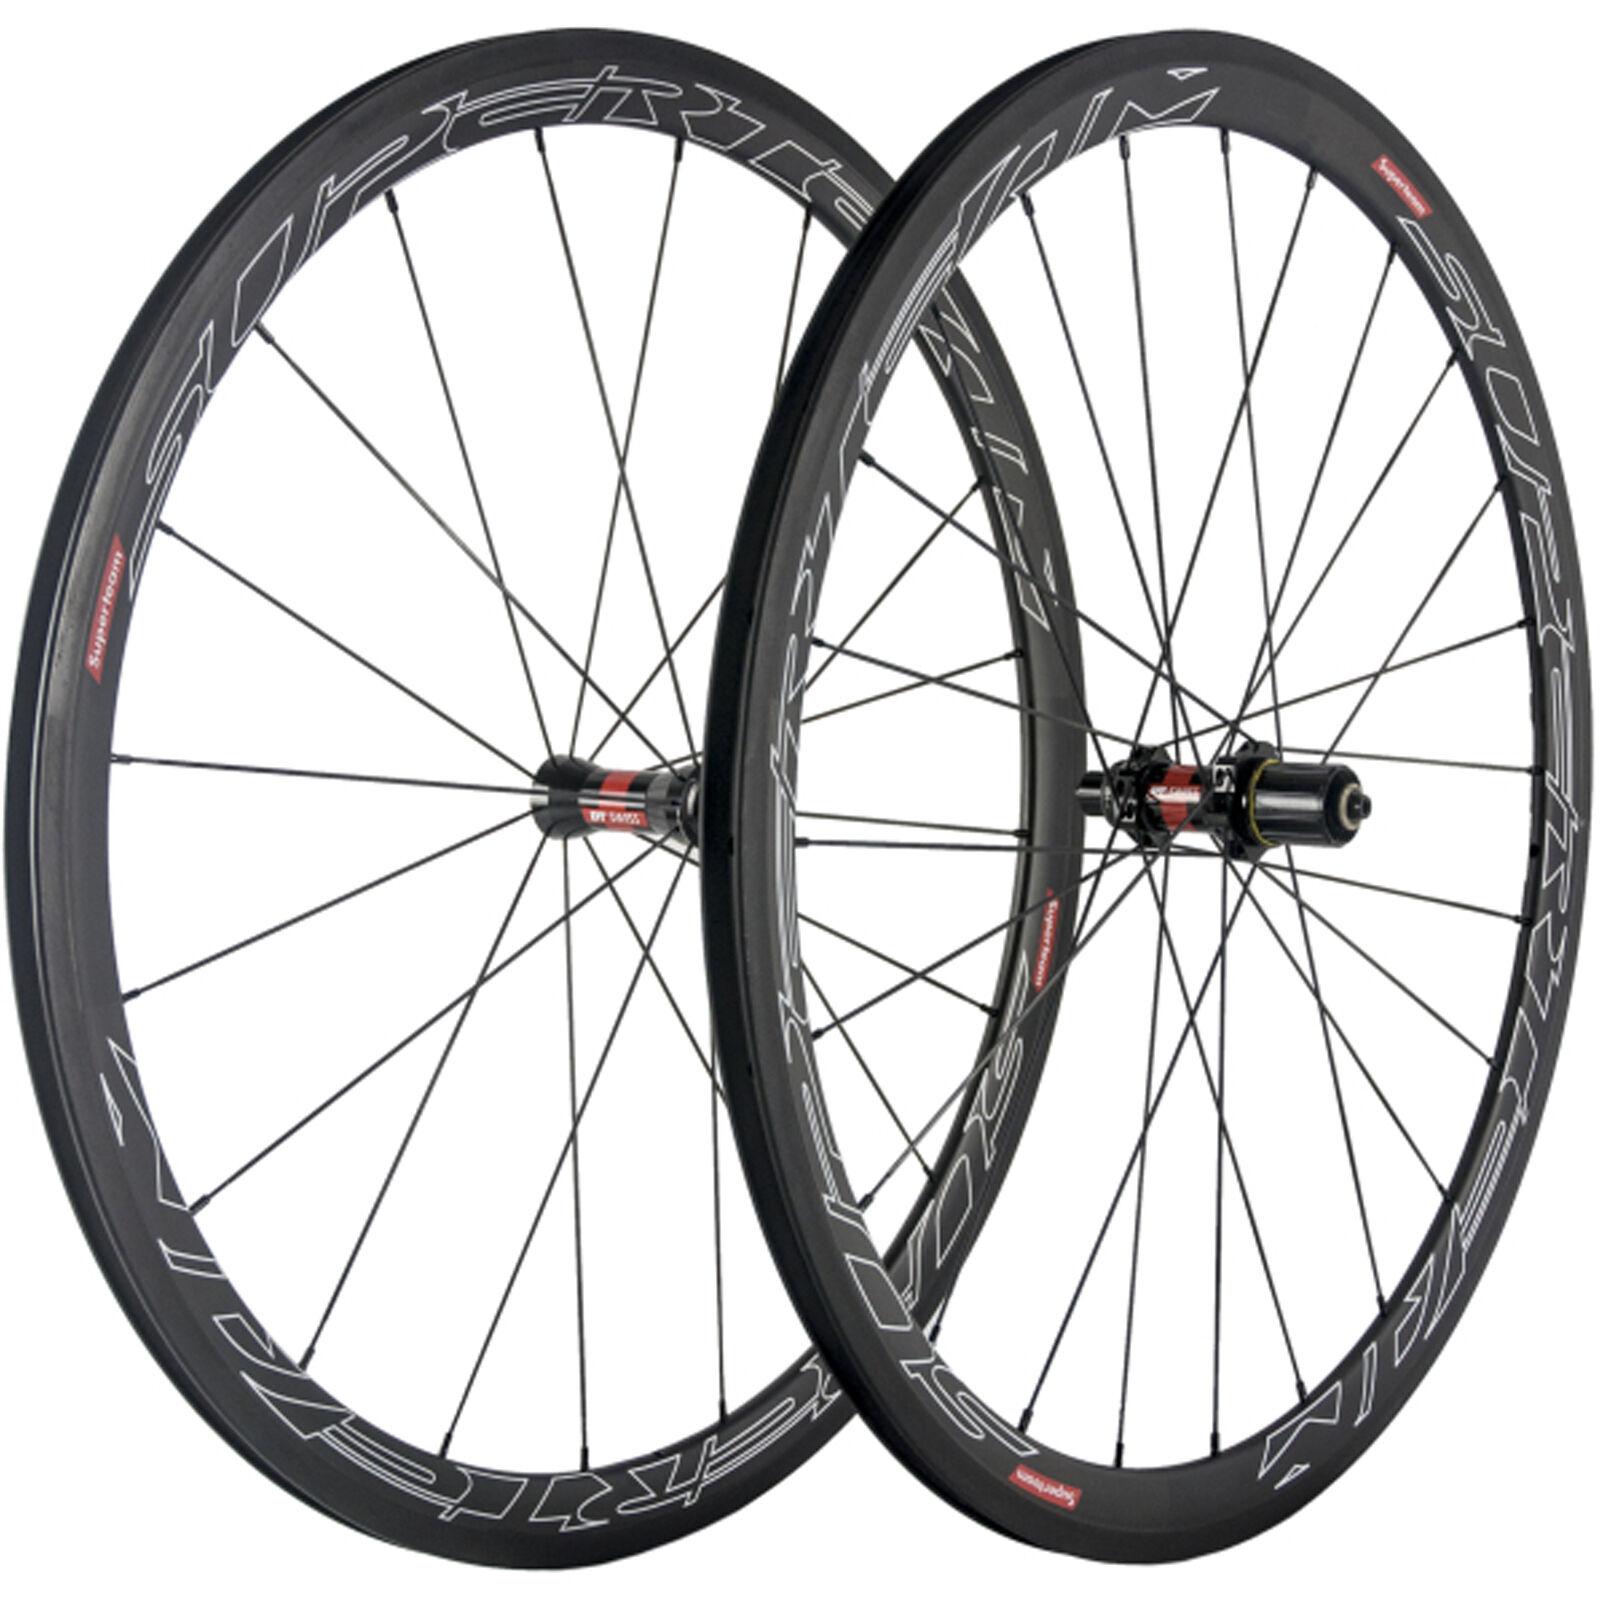 e64be197fa4 1 Pair 38mm Clincher Carbon Wheels Road Bike DT240S Matte Carbon Wheelset  UD Of orrcef4392-Wheels & Wheelsets